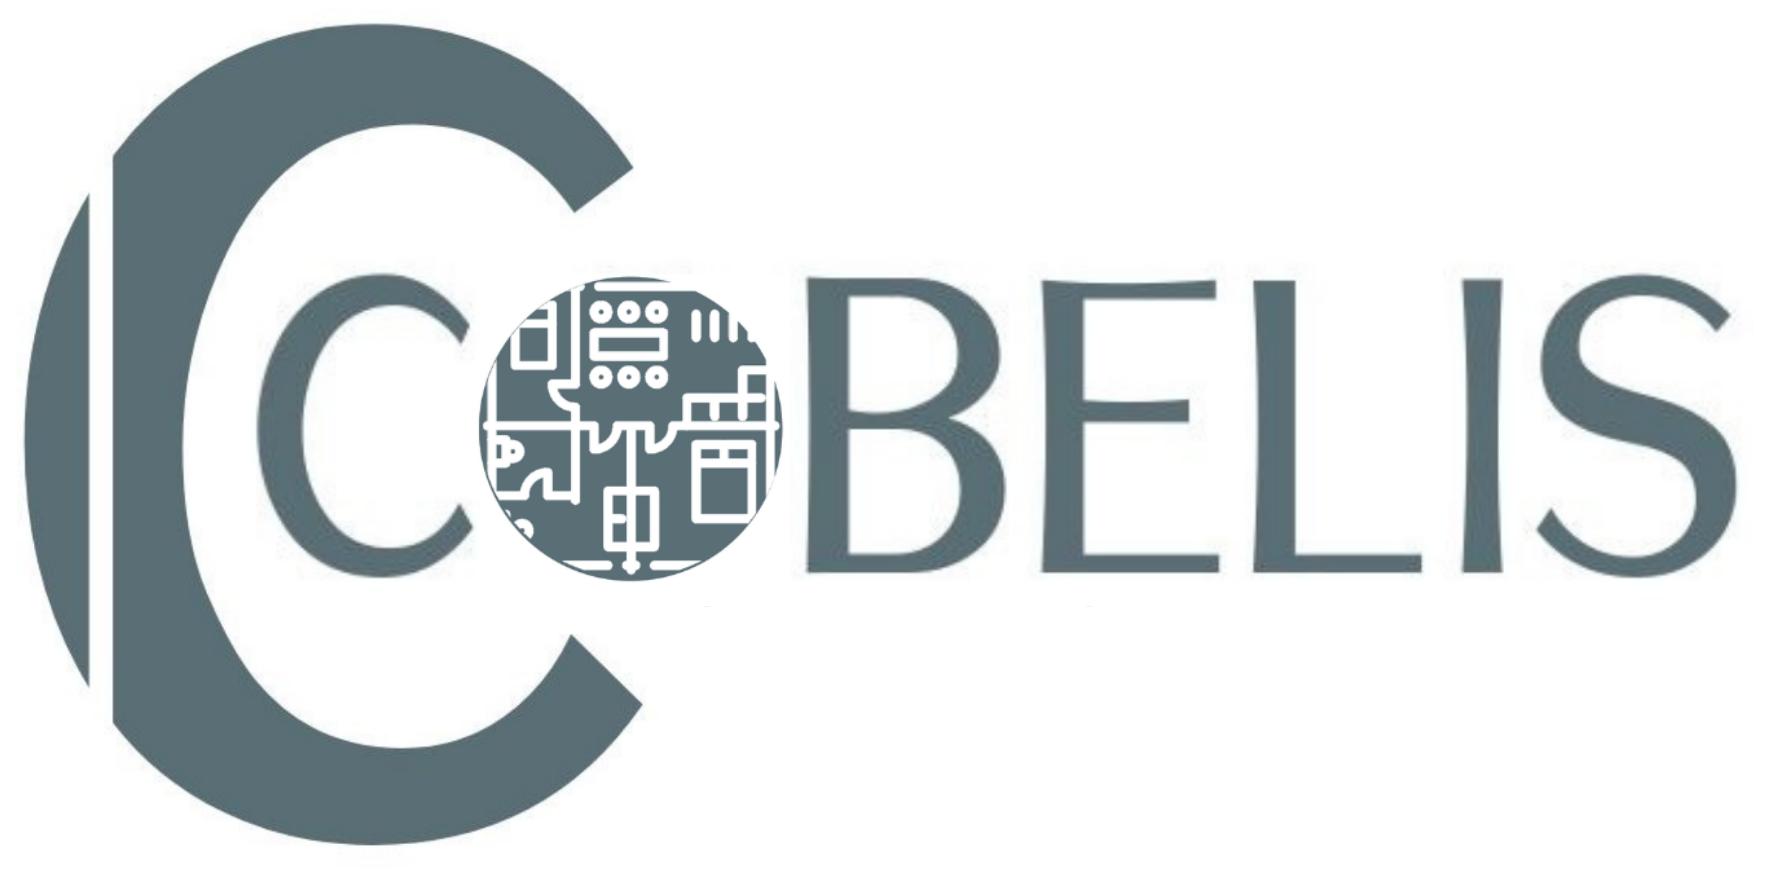 Cobelis